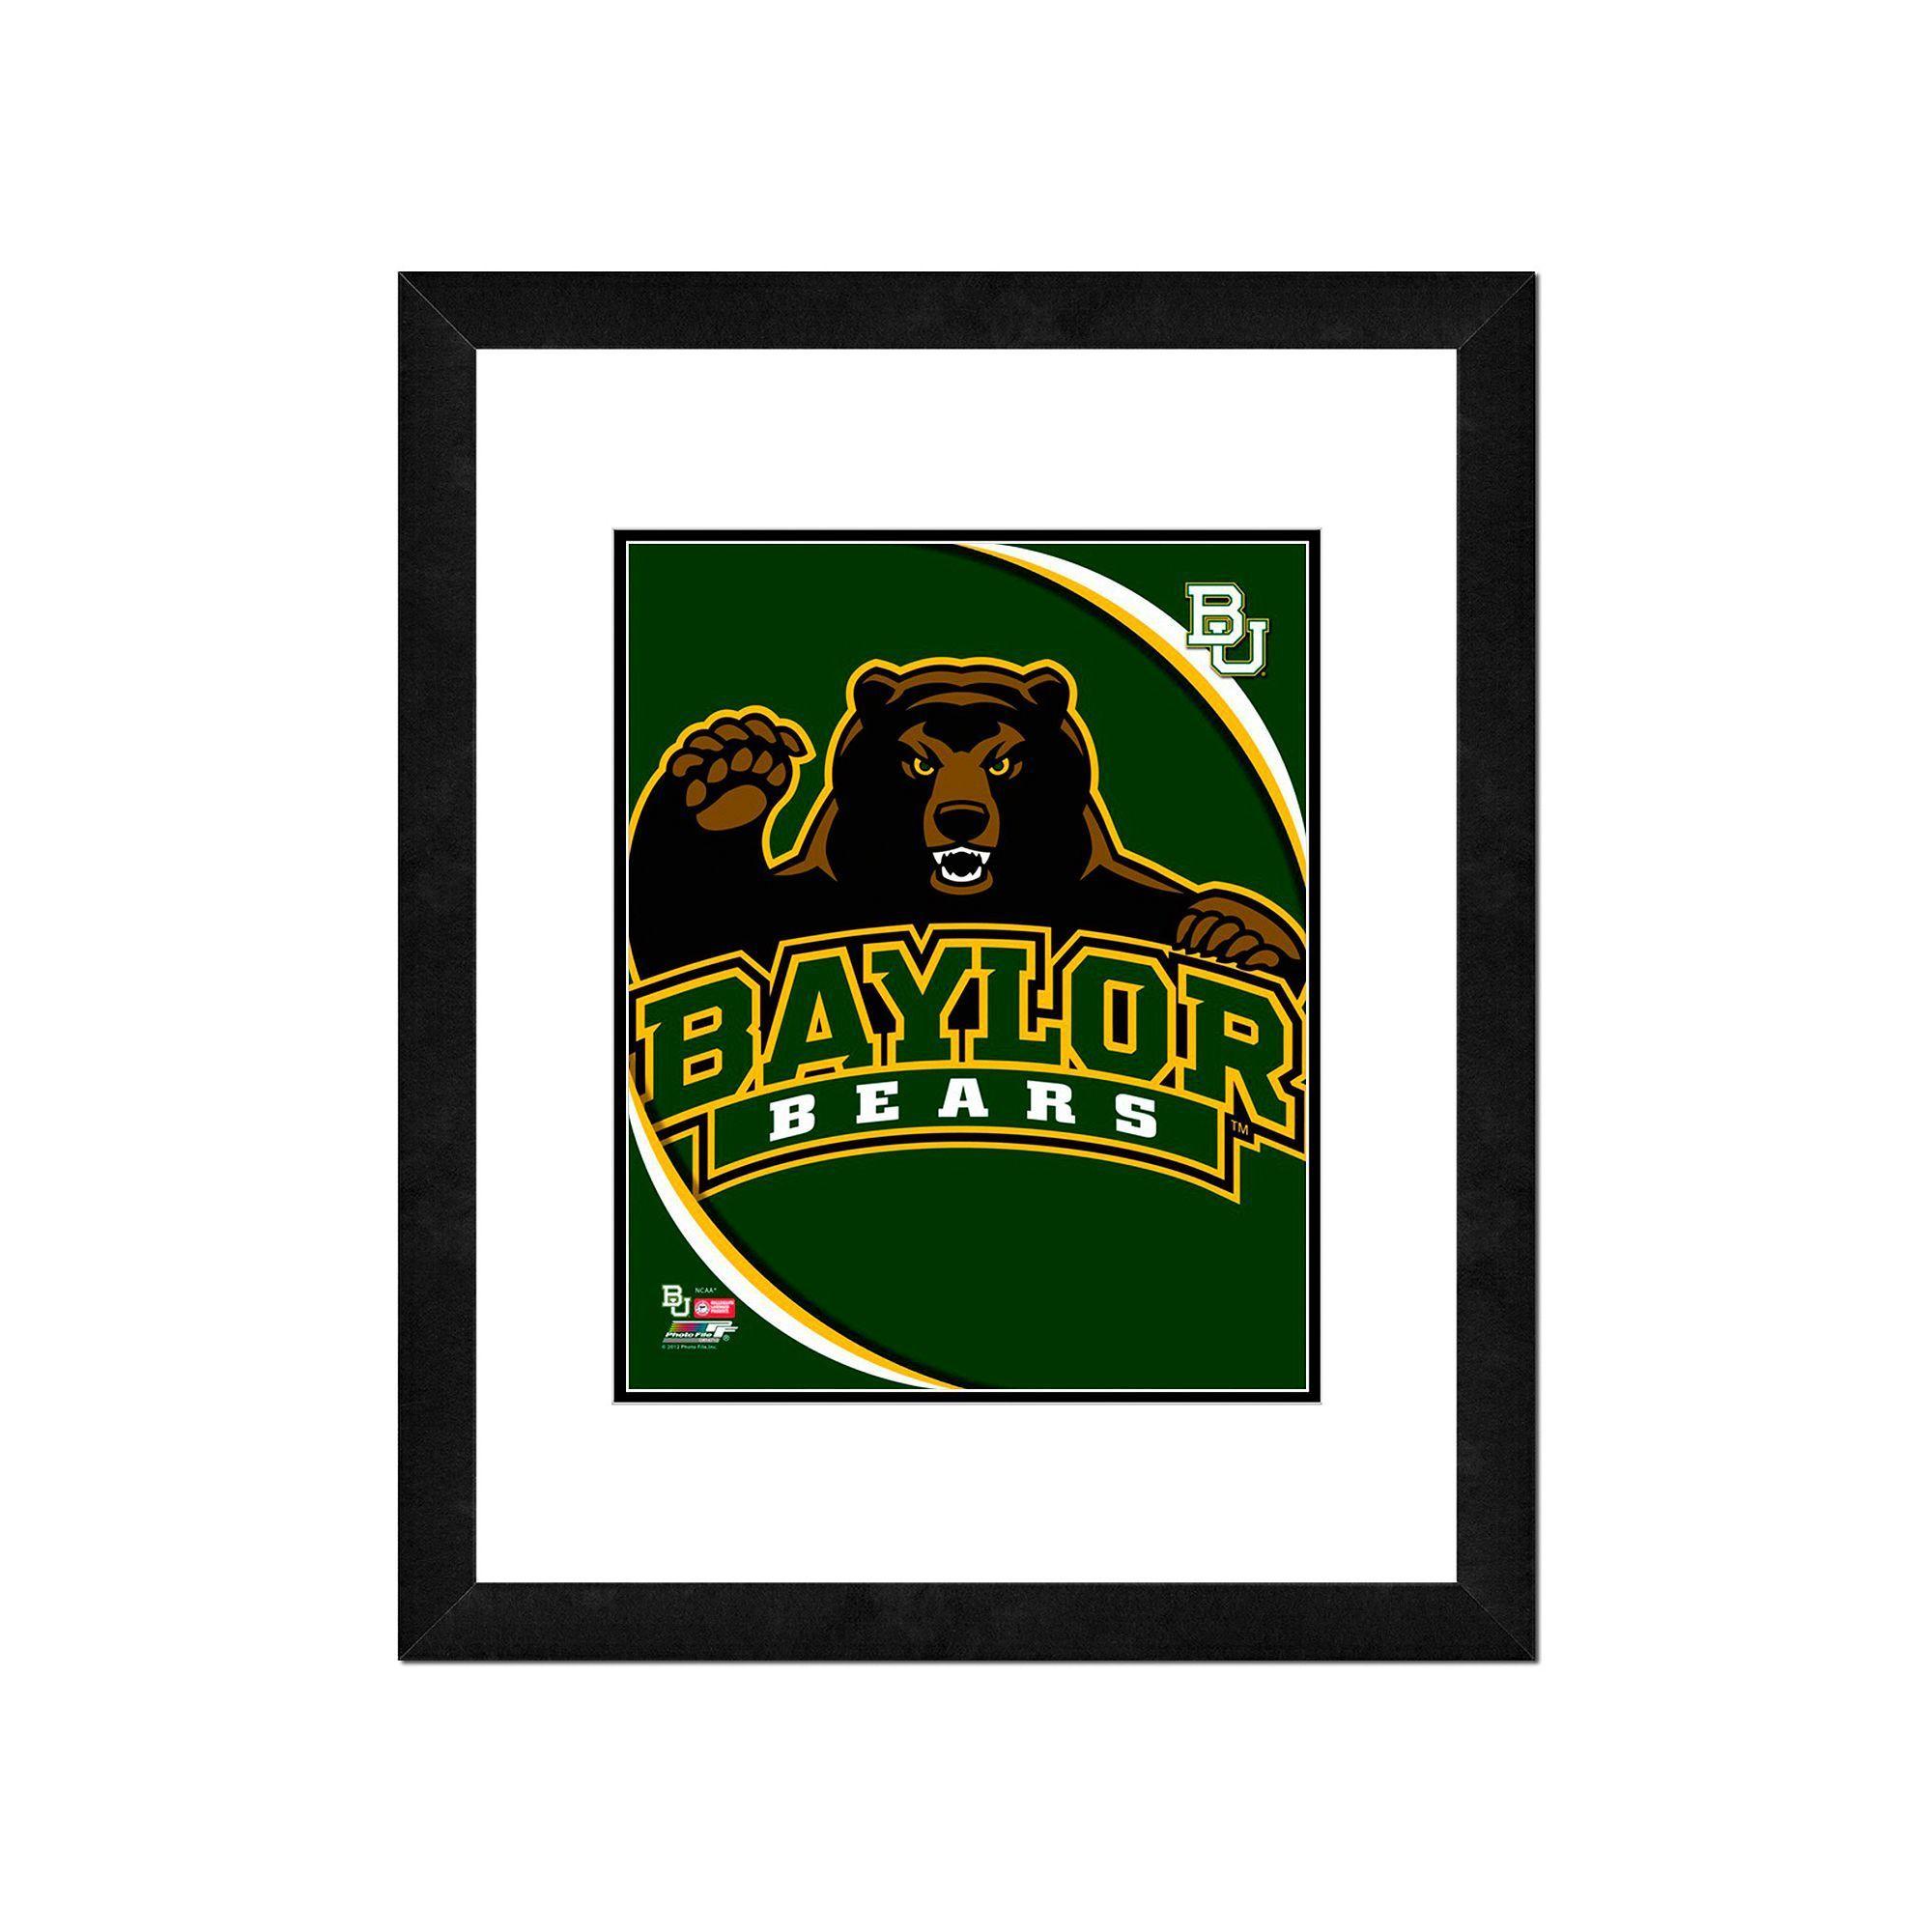 "Baylor Bears Team Logo Framed 11"" x 14"" Multicolor"